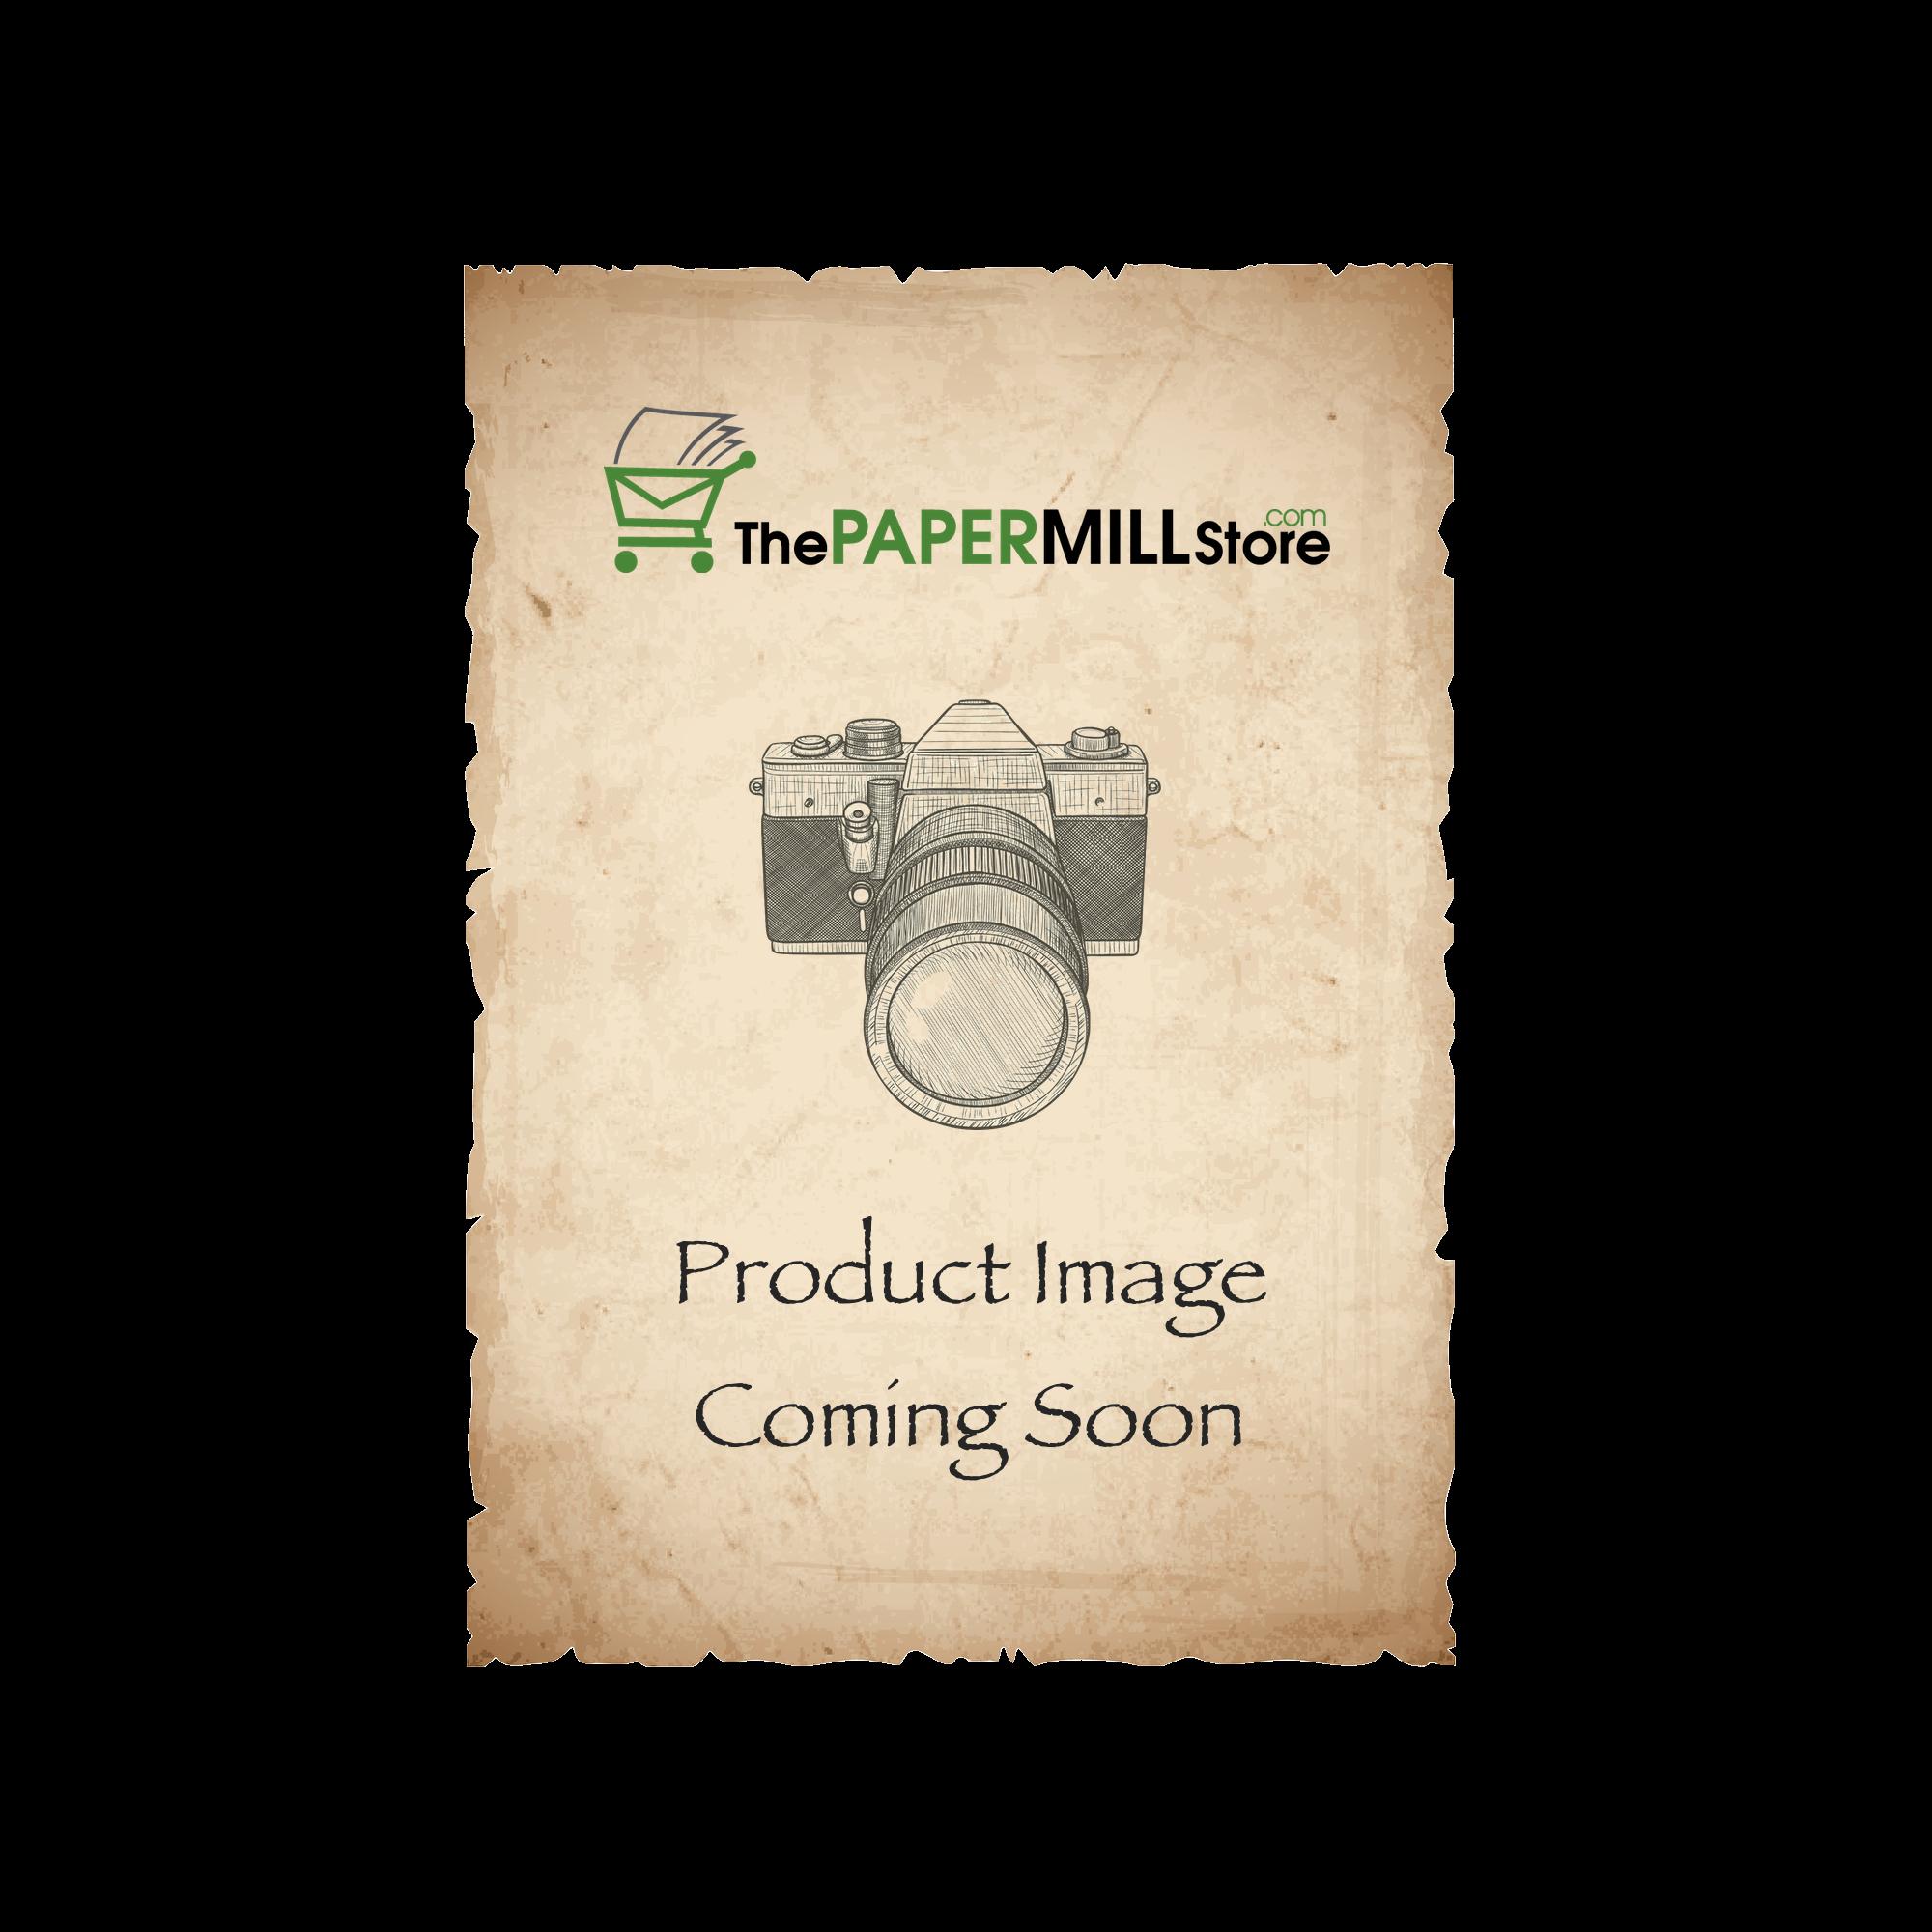 Kraft Brown/Brown Card Stock - 12 x 12 in 12 pt Cover Fiber 25 per Package